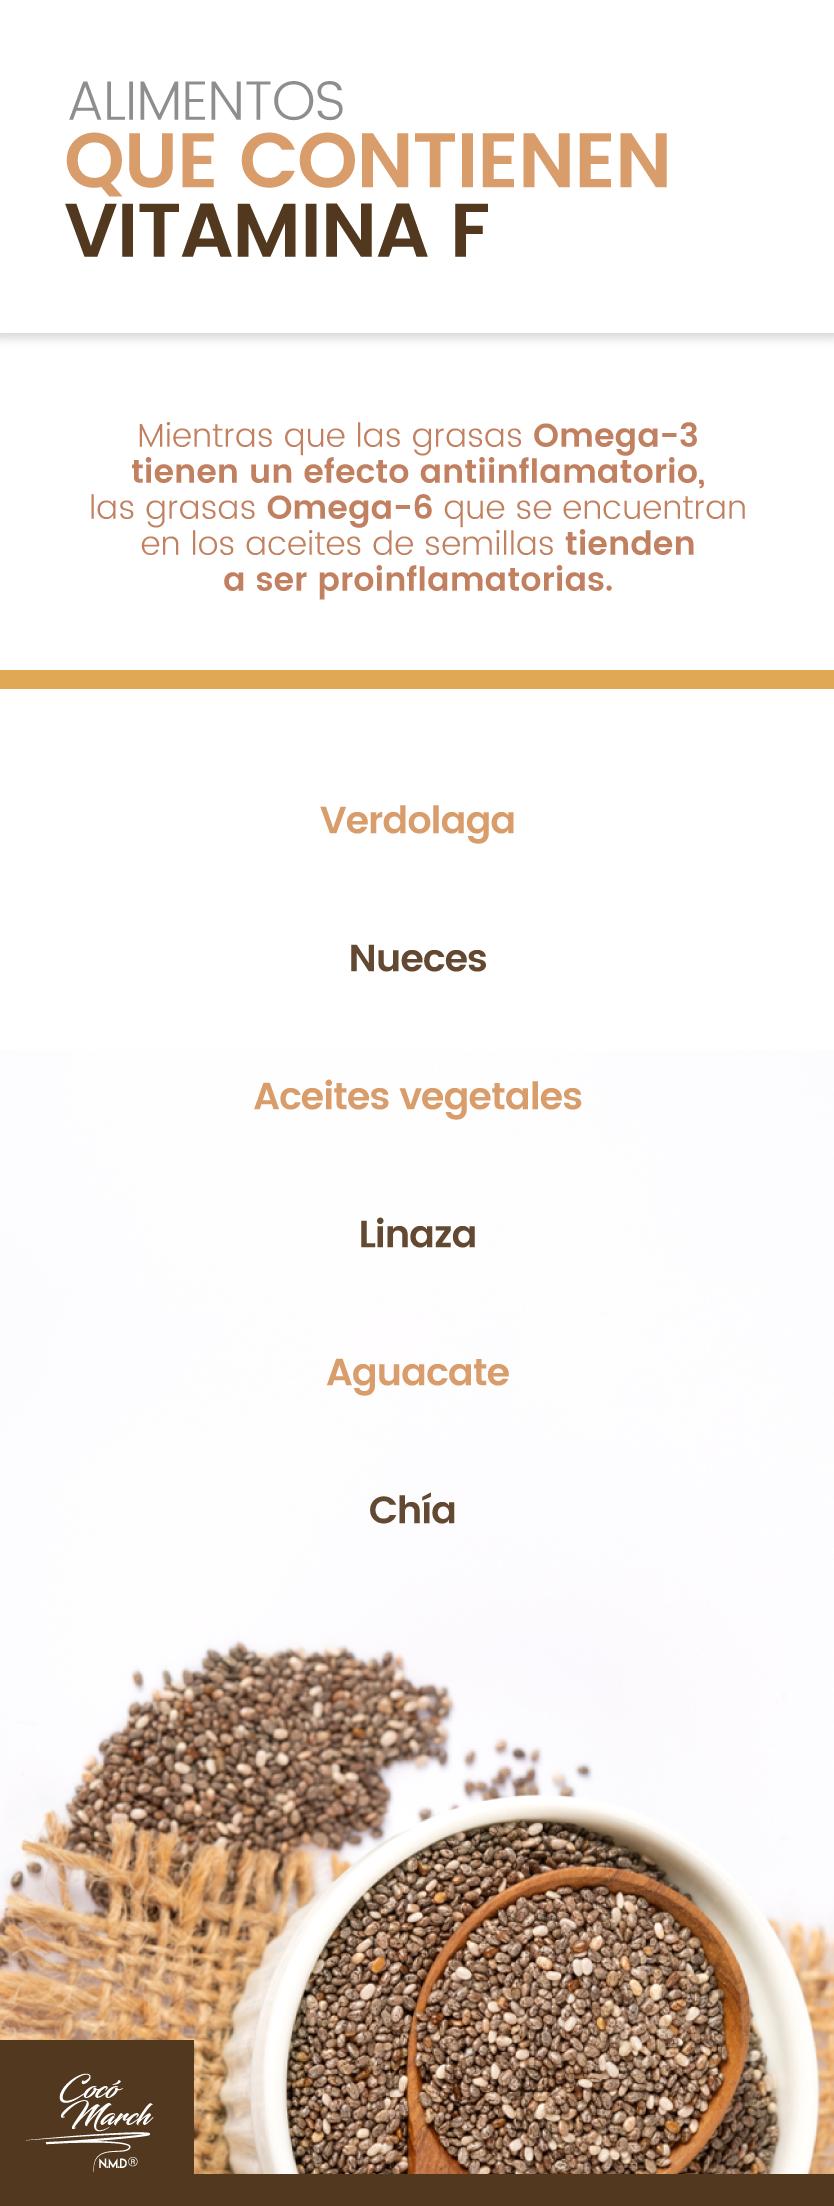 alimentos-con-vitamina-f